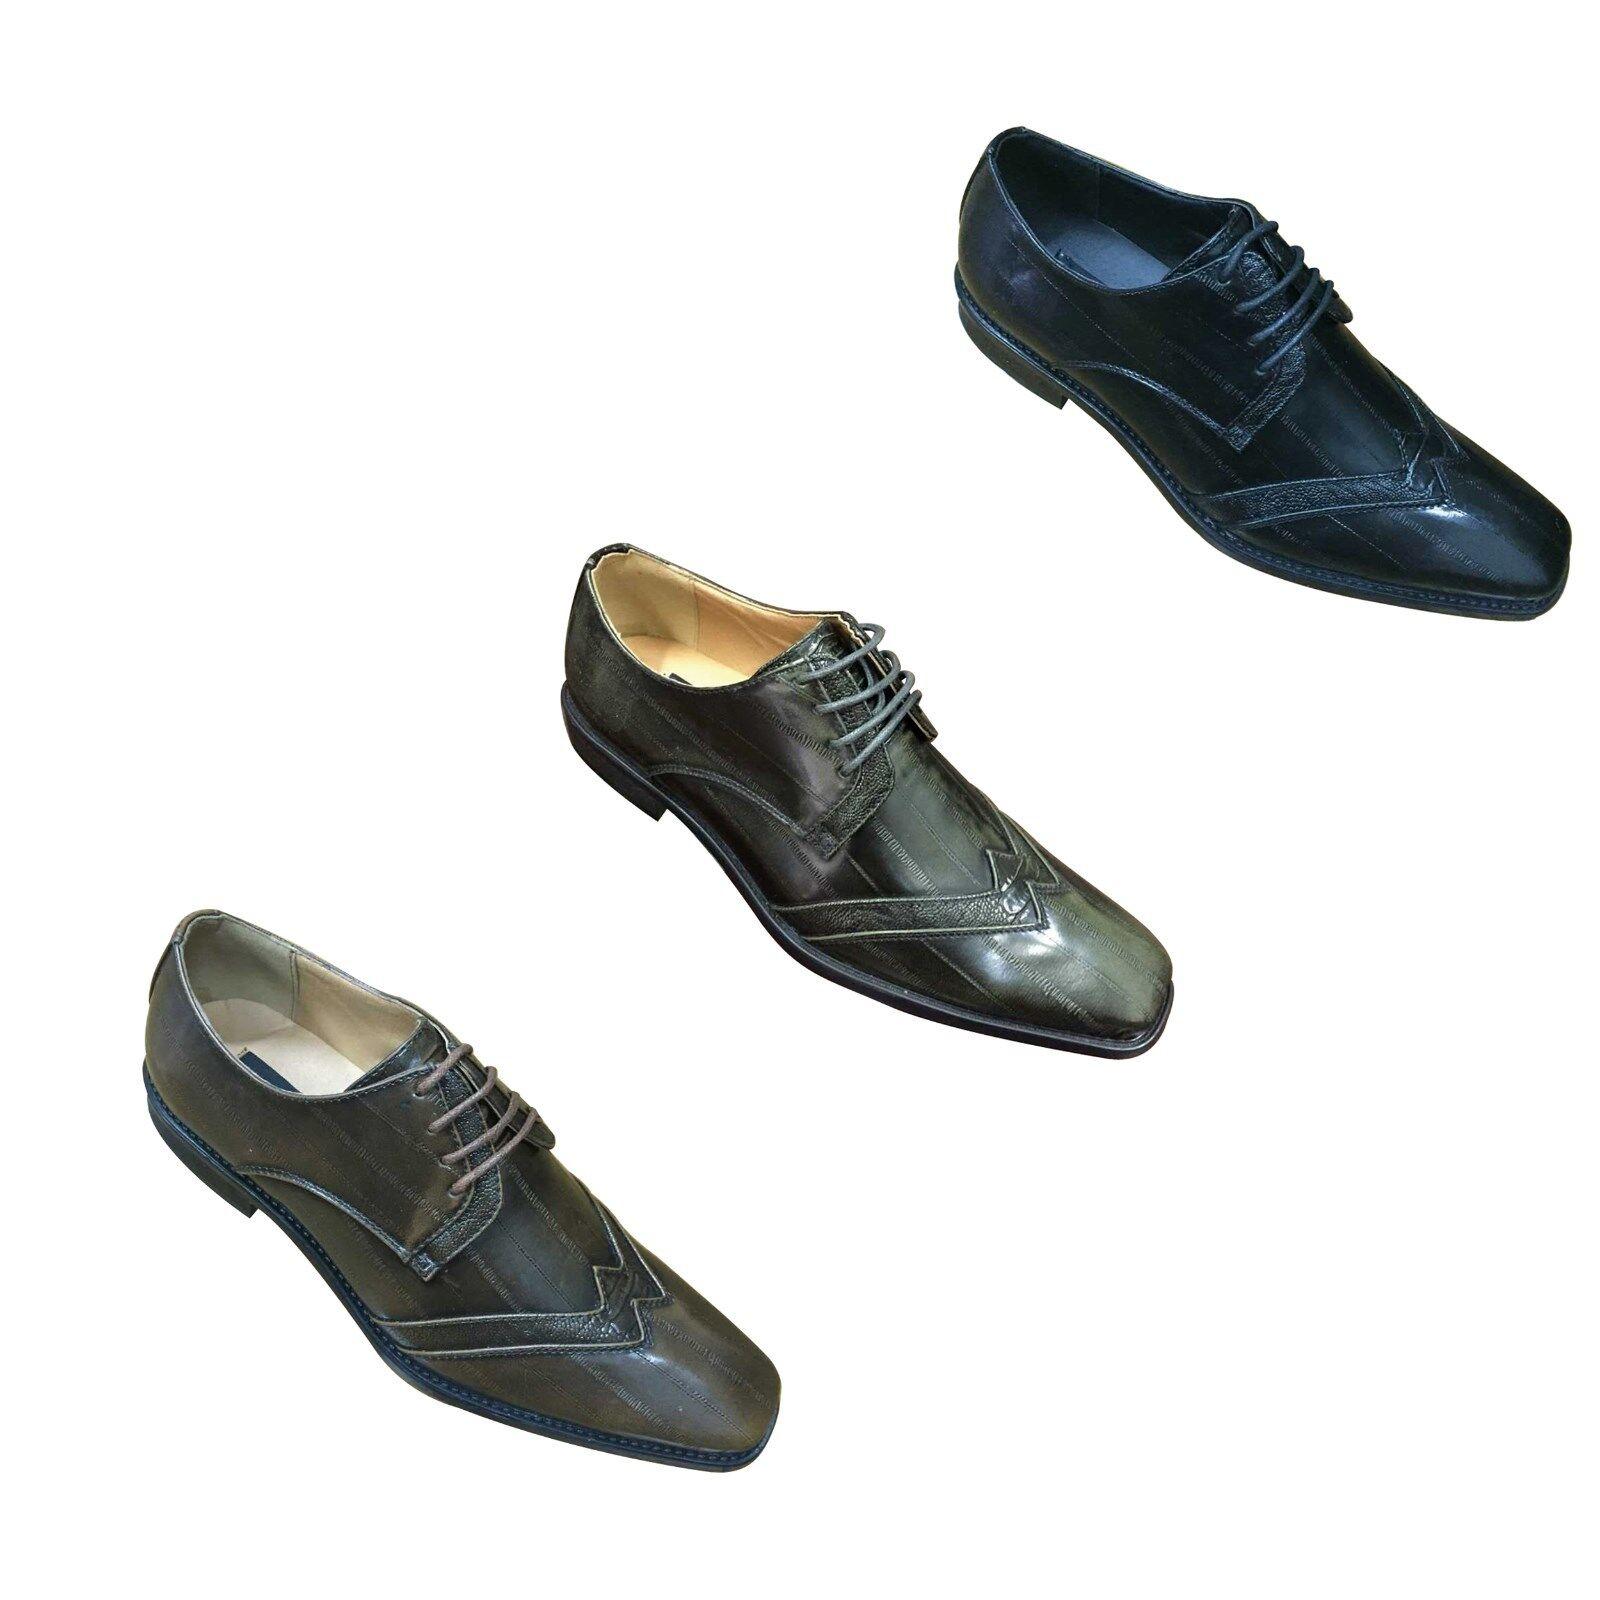 Men's Shoes Elegant Madden Wintip Oxfords Shoes Men's  Design By Fortion Landi's Style 5758 a814f1